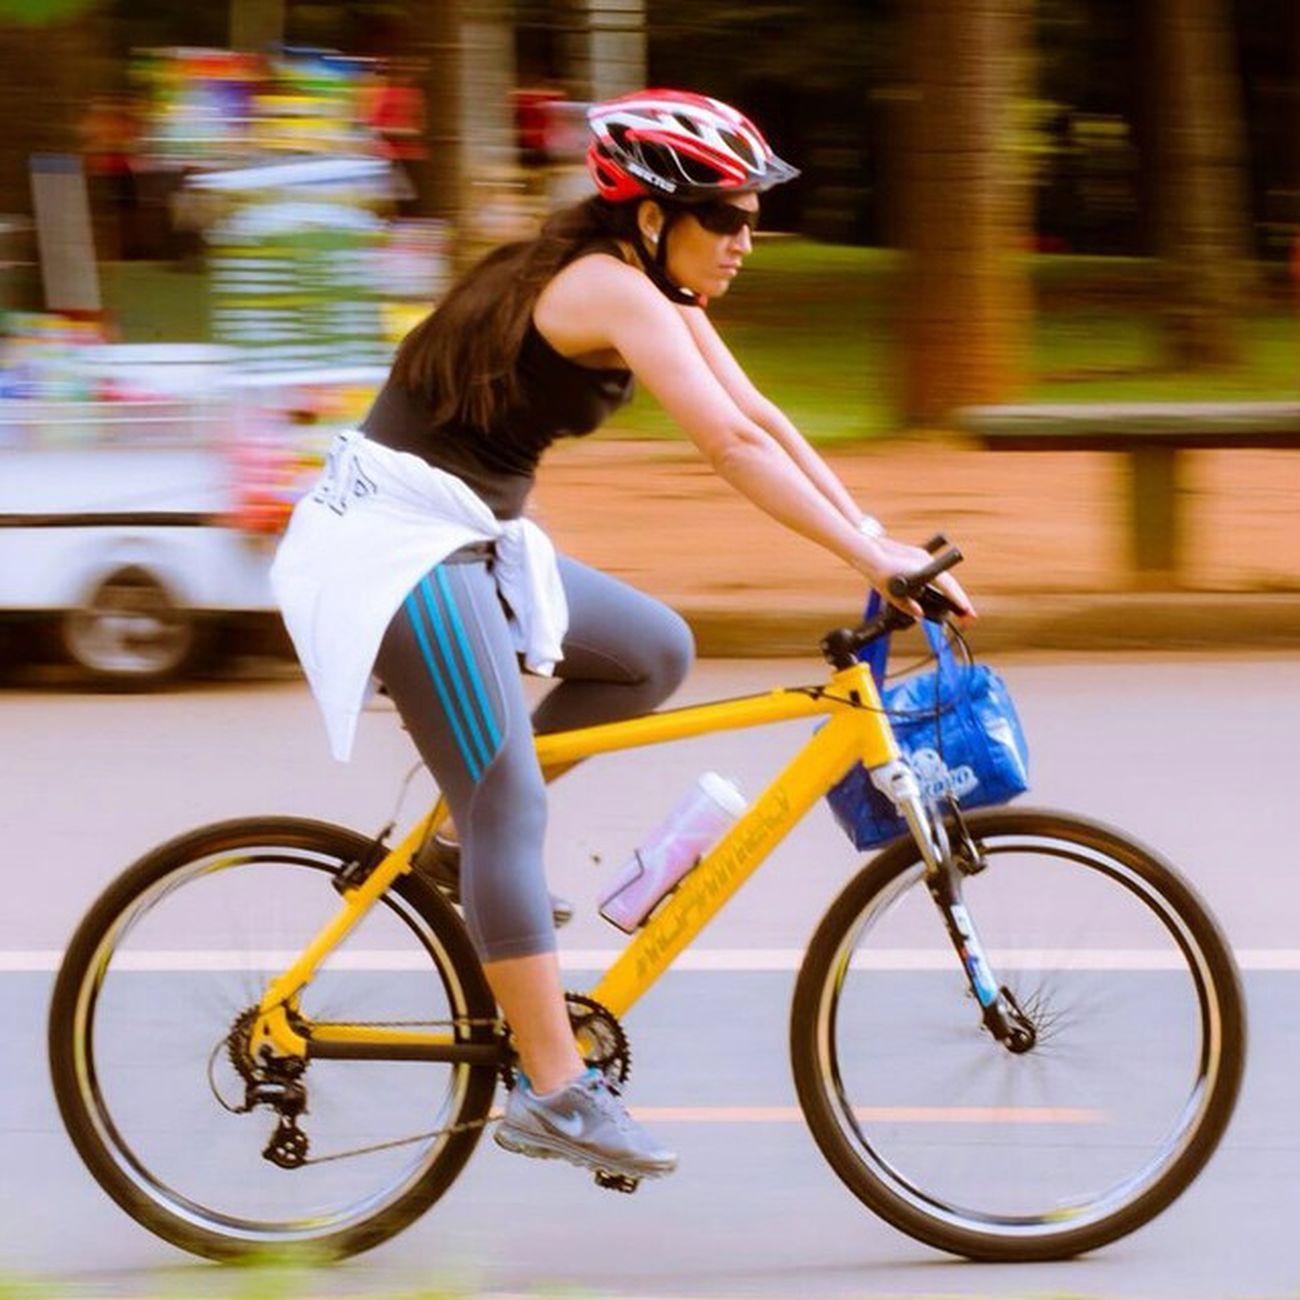 Parque do ibirapuera Ibi Fotografia D7000 Followme Encontrofui Instago Nature Natureza Nikon Sunday Tree Peoples Parque  Bike Splover Sampa Spwalker SP Euamosp Panning Ciclismo